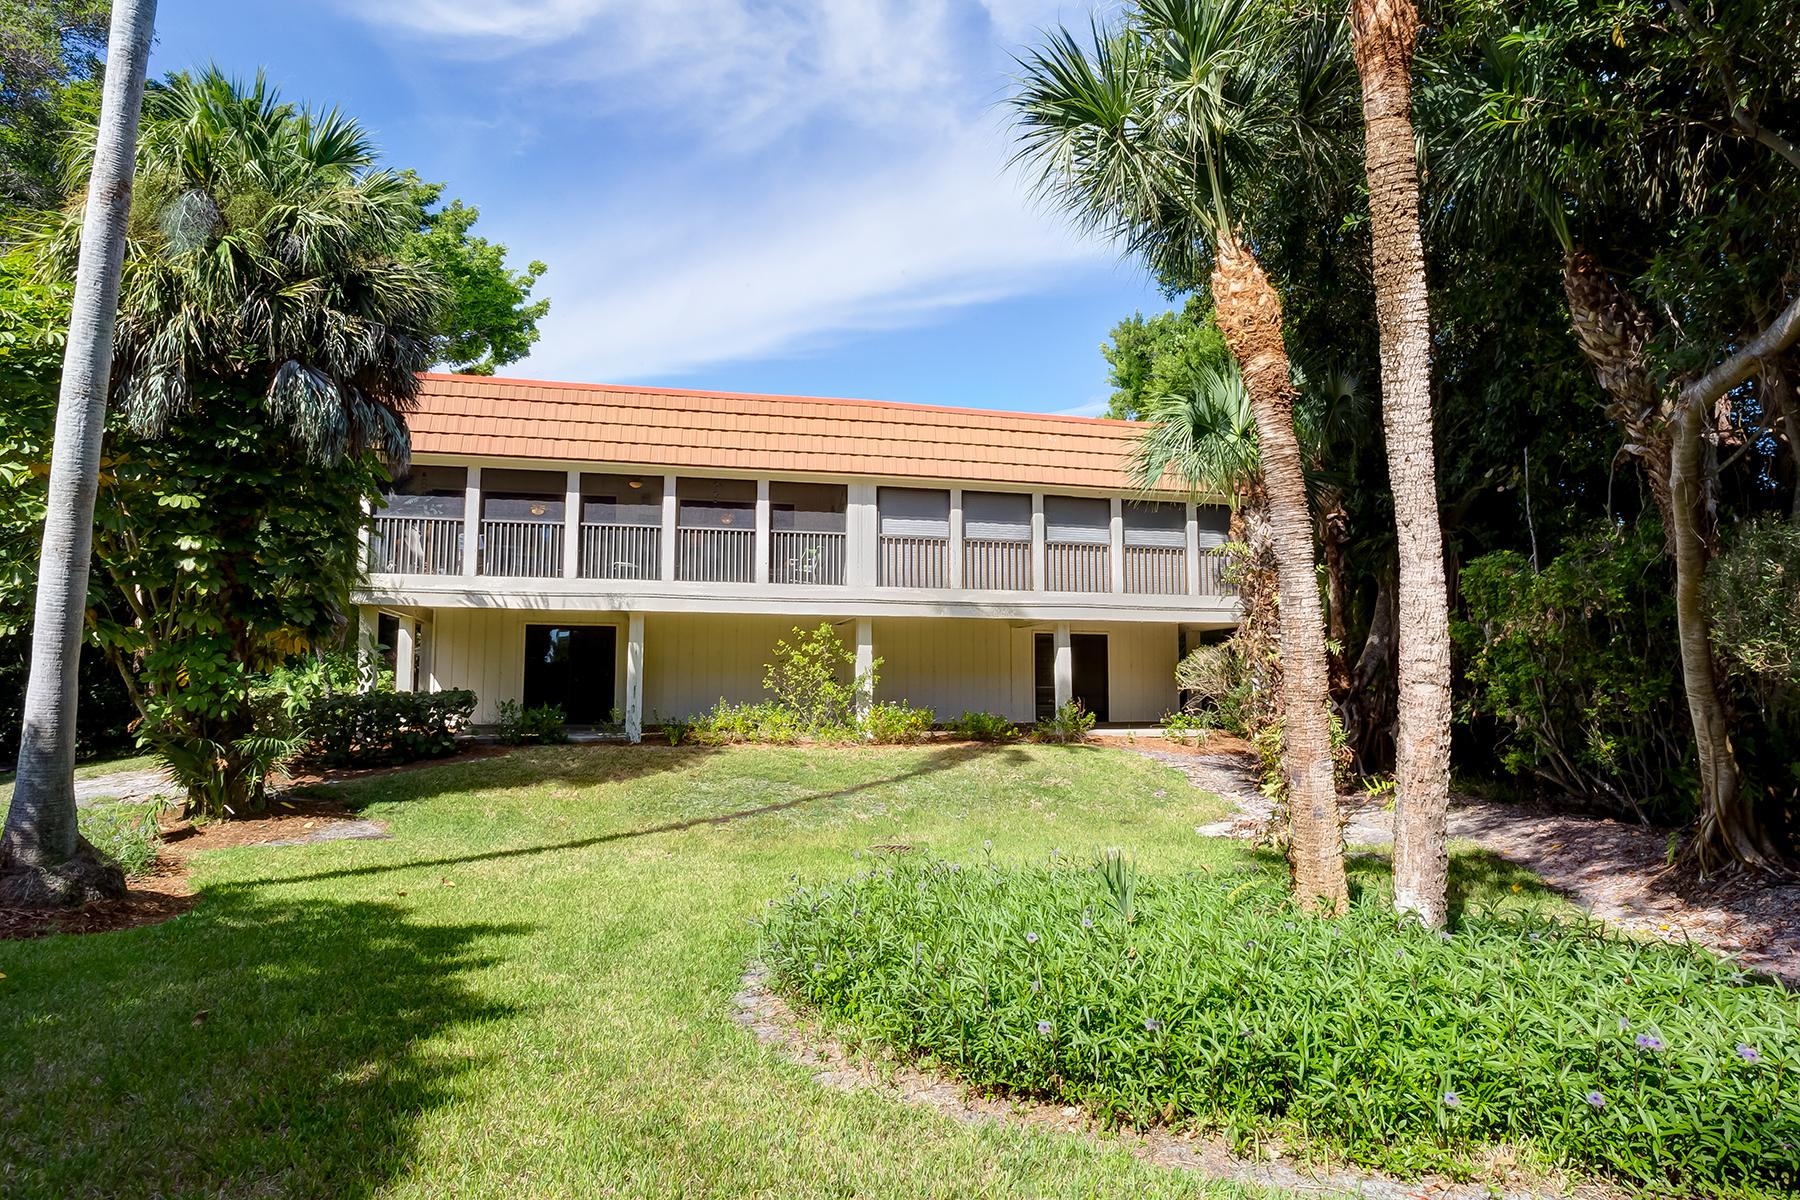 Condominio per Vendita alle ore SANIBEL 303 Periwinkle Way 312 Sanibel, Florida, 33957 Stati Uniti